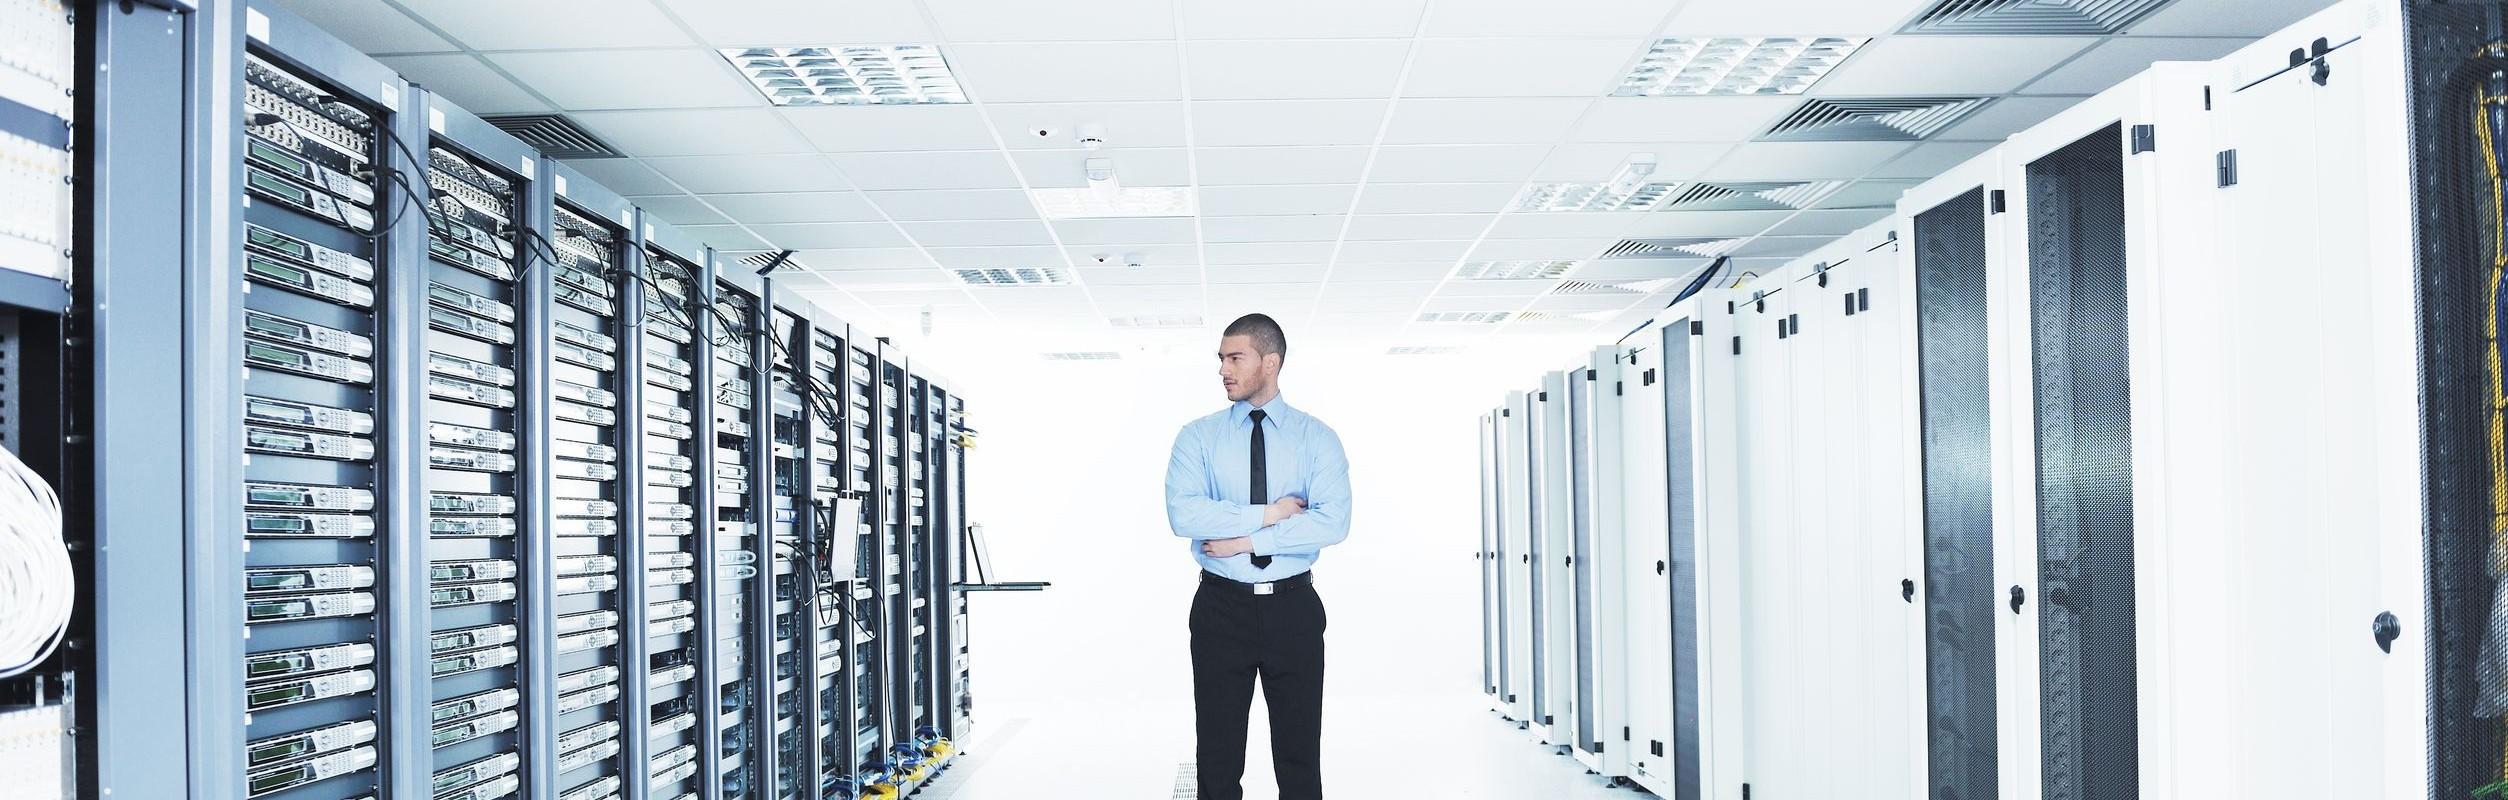 Rack Mounts for Datacenters